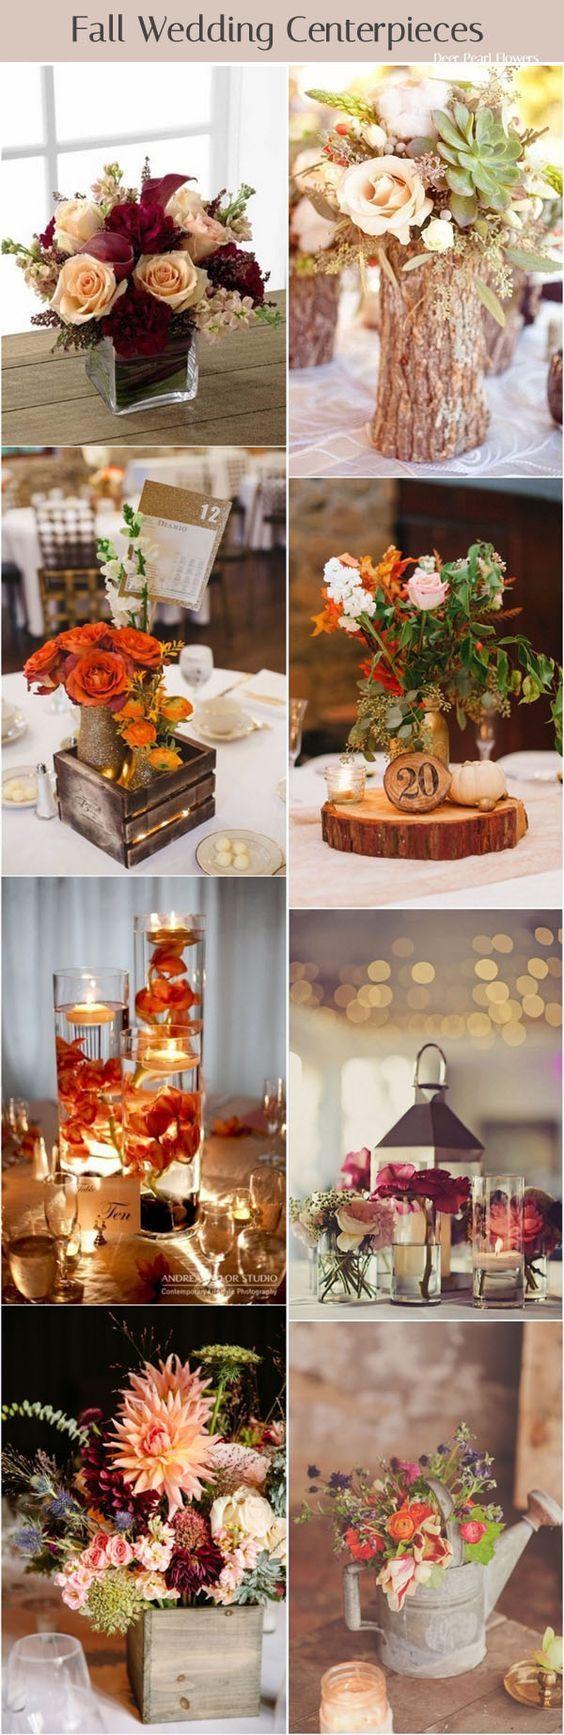 Best wedding centerpieces images on pinterest trends